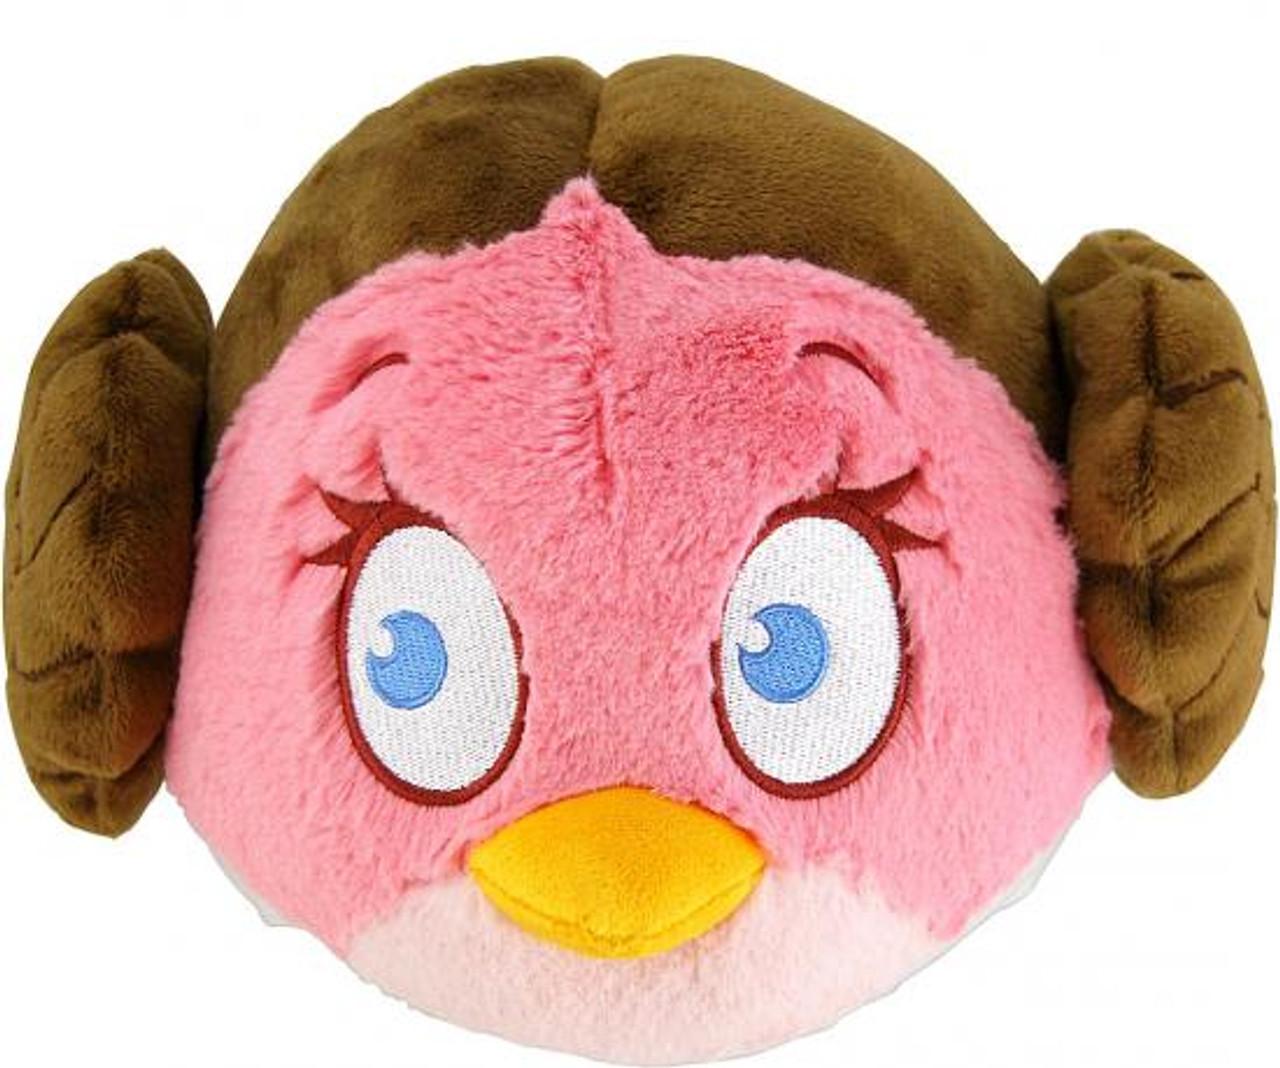 Star Wars Angry Birds Princess Leia Bird 12-Inch Plush